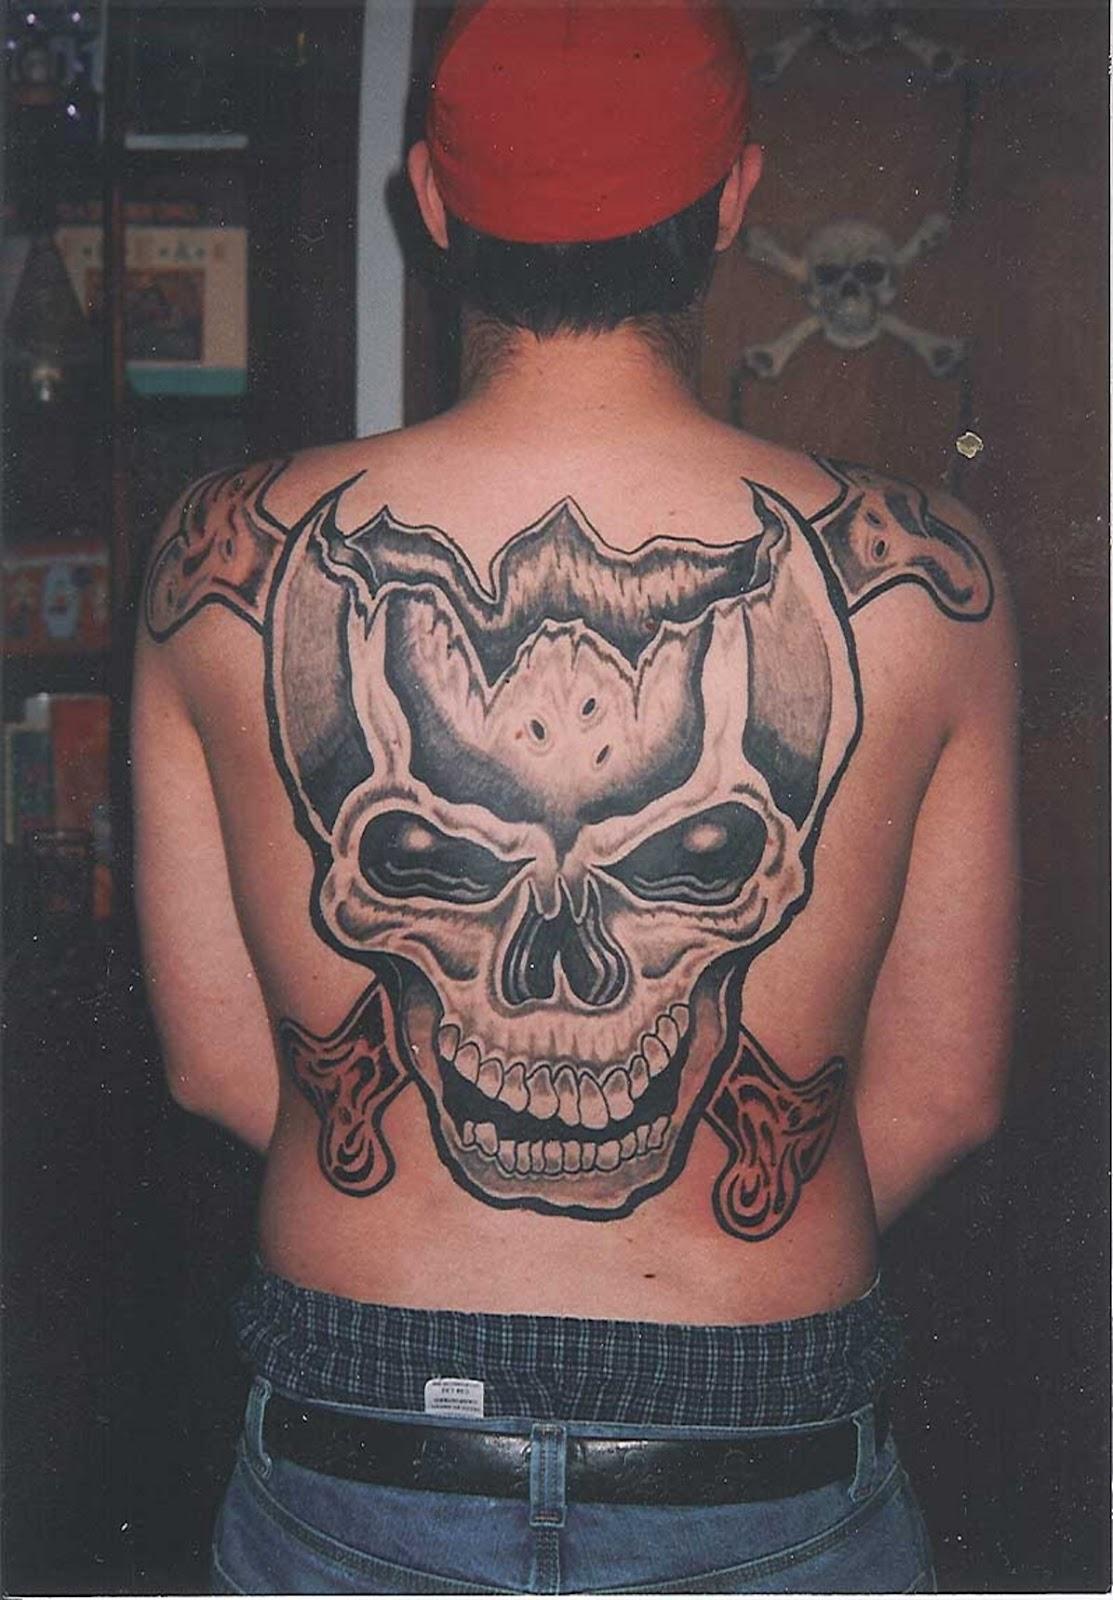 http://4.bp.blogspot.com/-yvh6aRQXMTE/TzvdngdNaRI/AAAAAAAABRE/p_0QRBGC_fY/s1600/skull-tattoos-on-back-1530.jpg